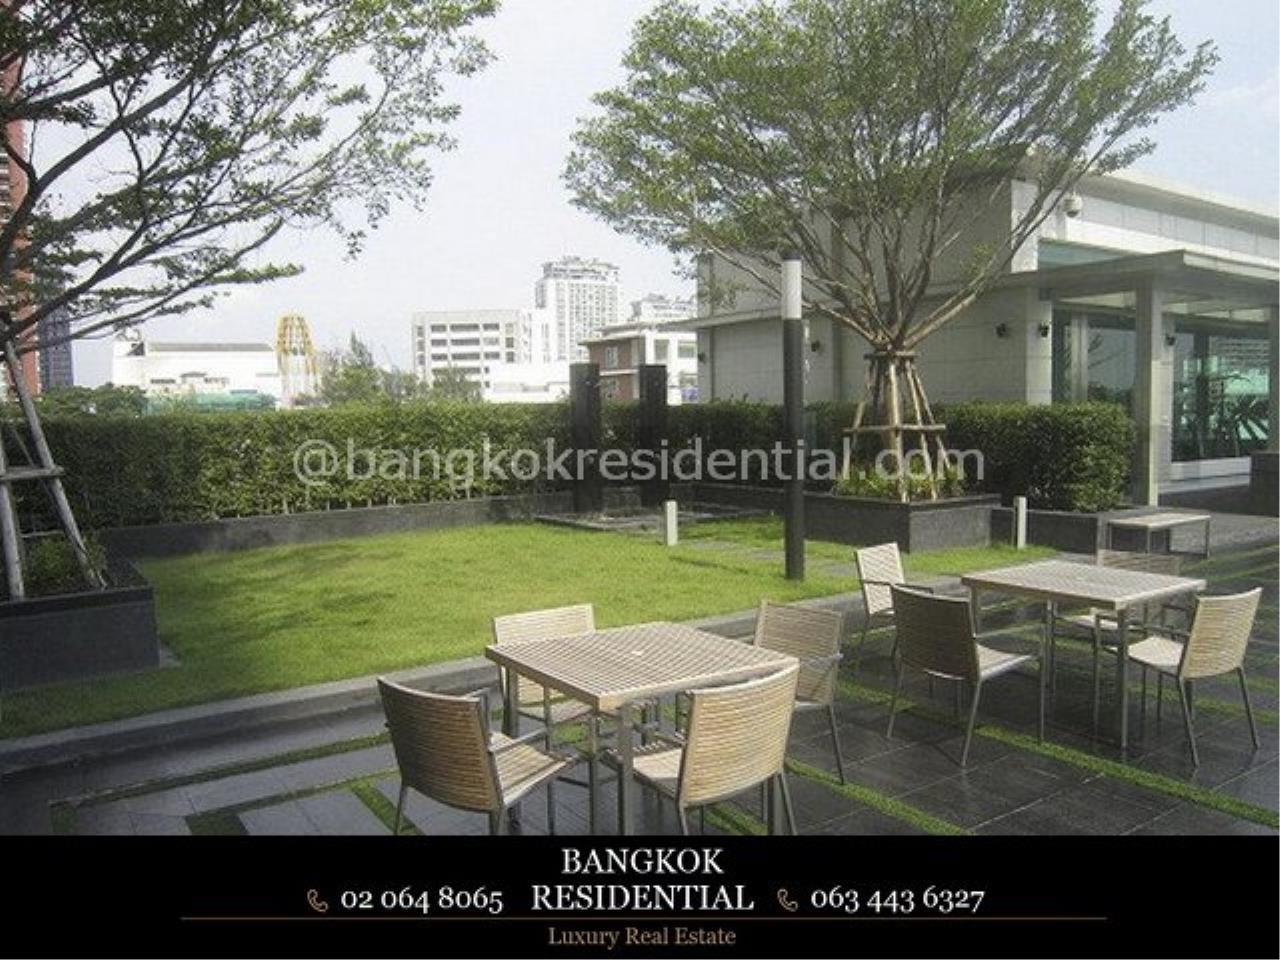 Bangkok Residential Agency's 1BR Siri at Sukhumvit For Rent (BR4782CD) 7